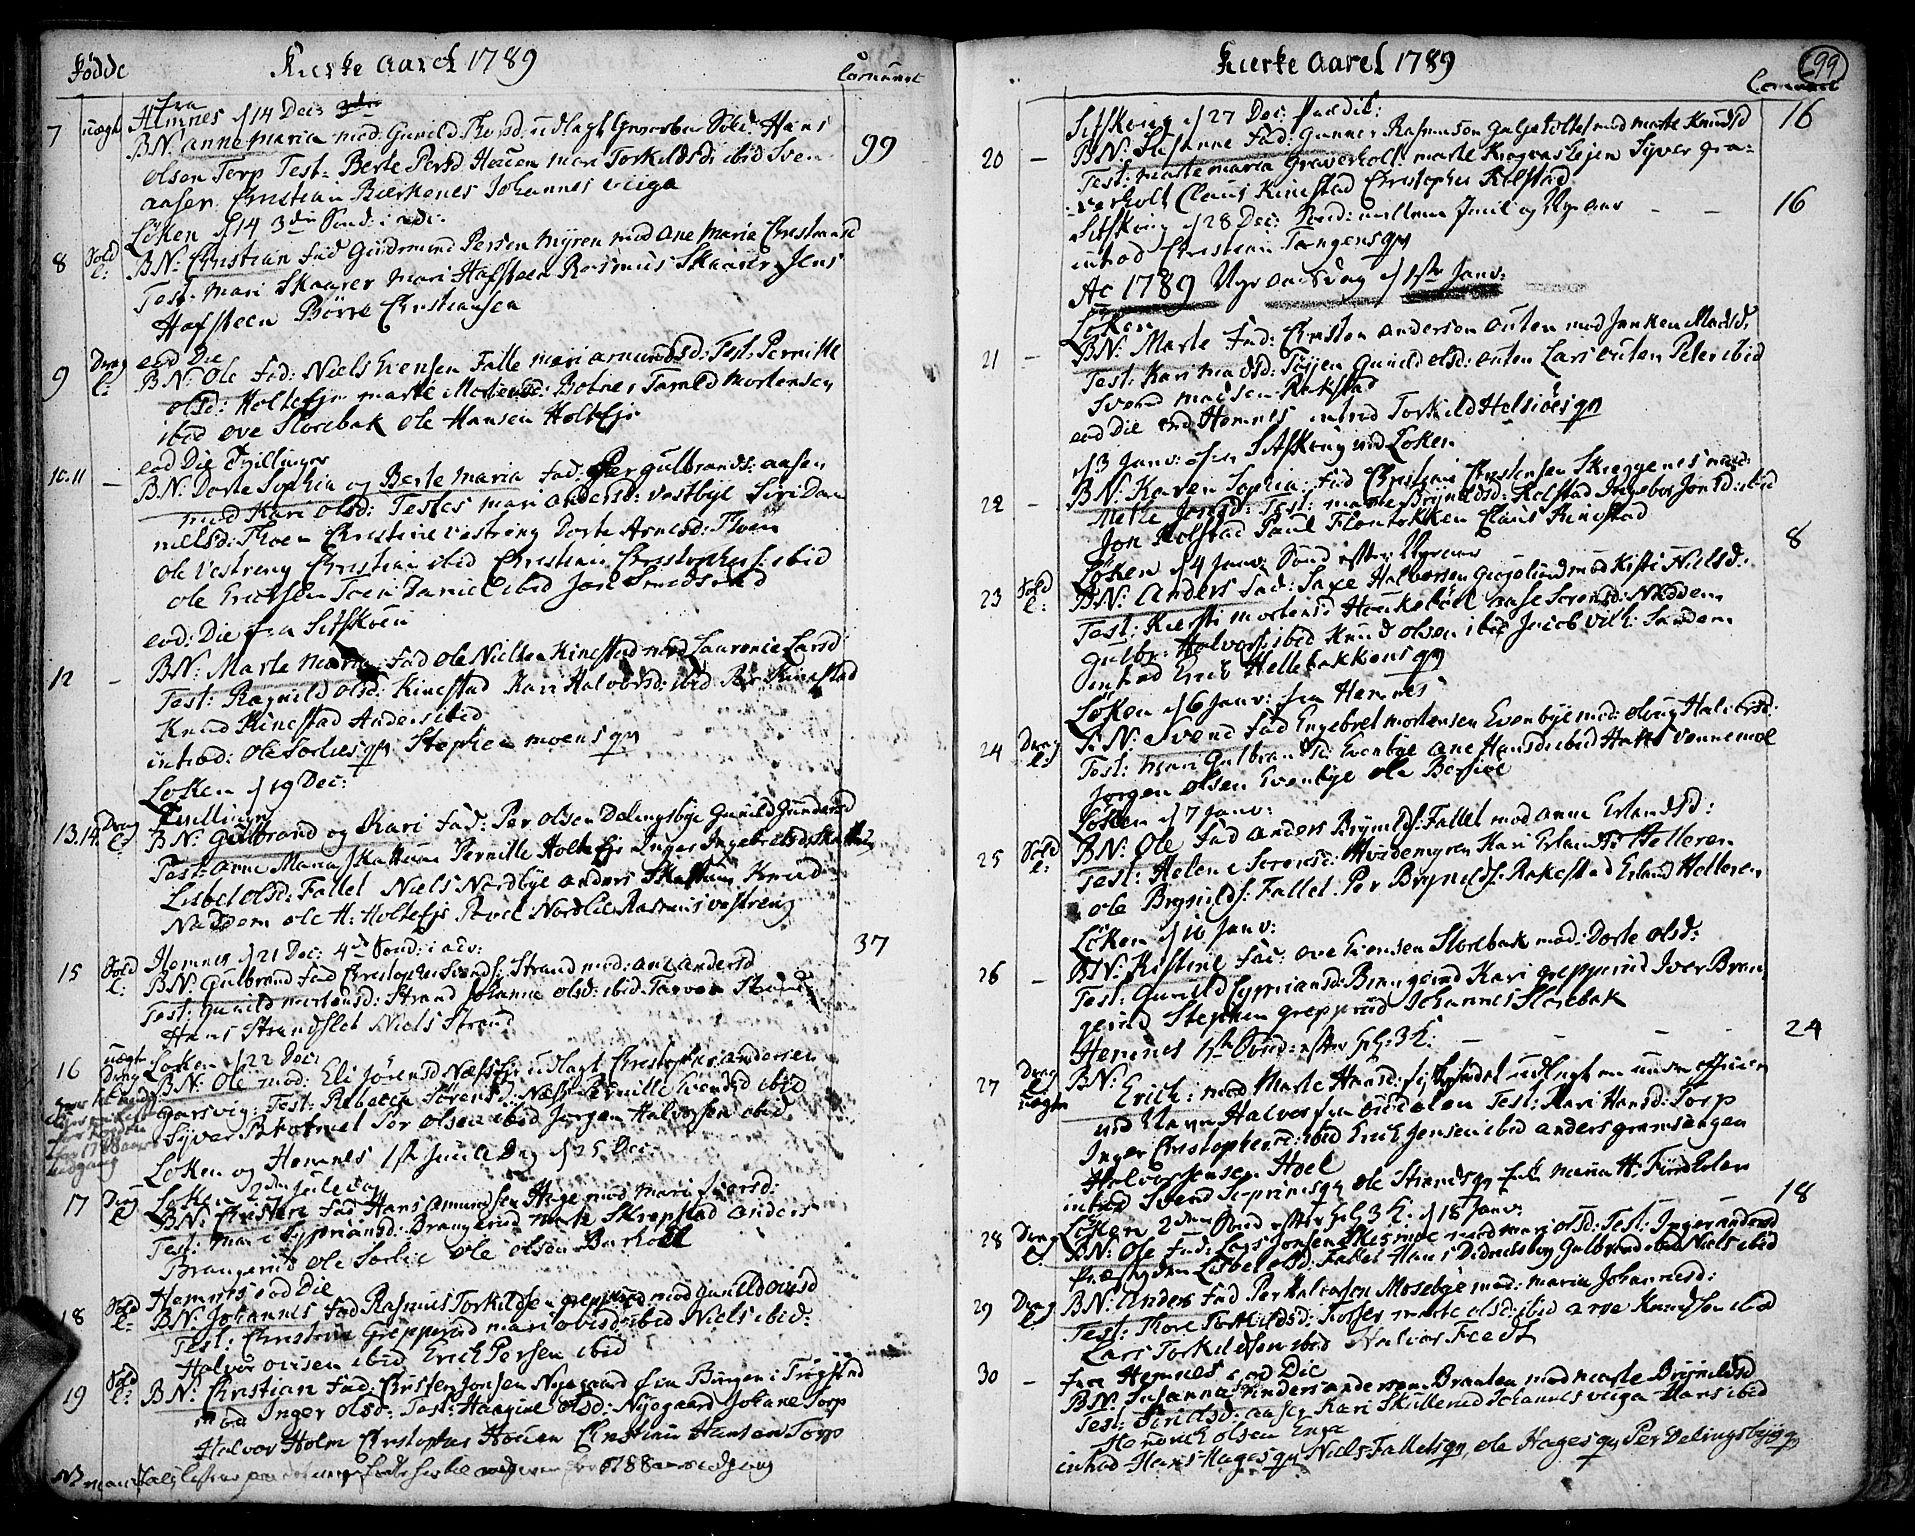 SAO, Høland prestekontor Kirkebøker, F/Fa/L0005: Ministerialbok nr. I 5, 1780-1793, s. 99